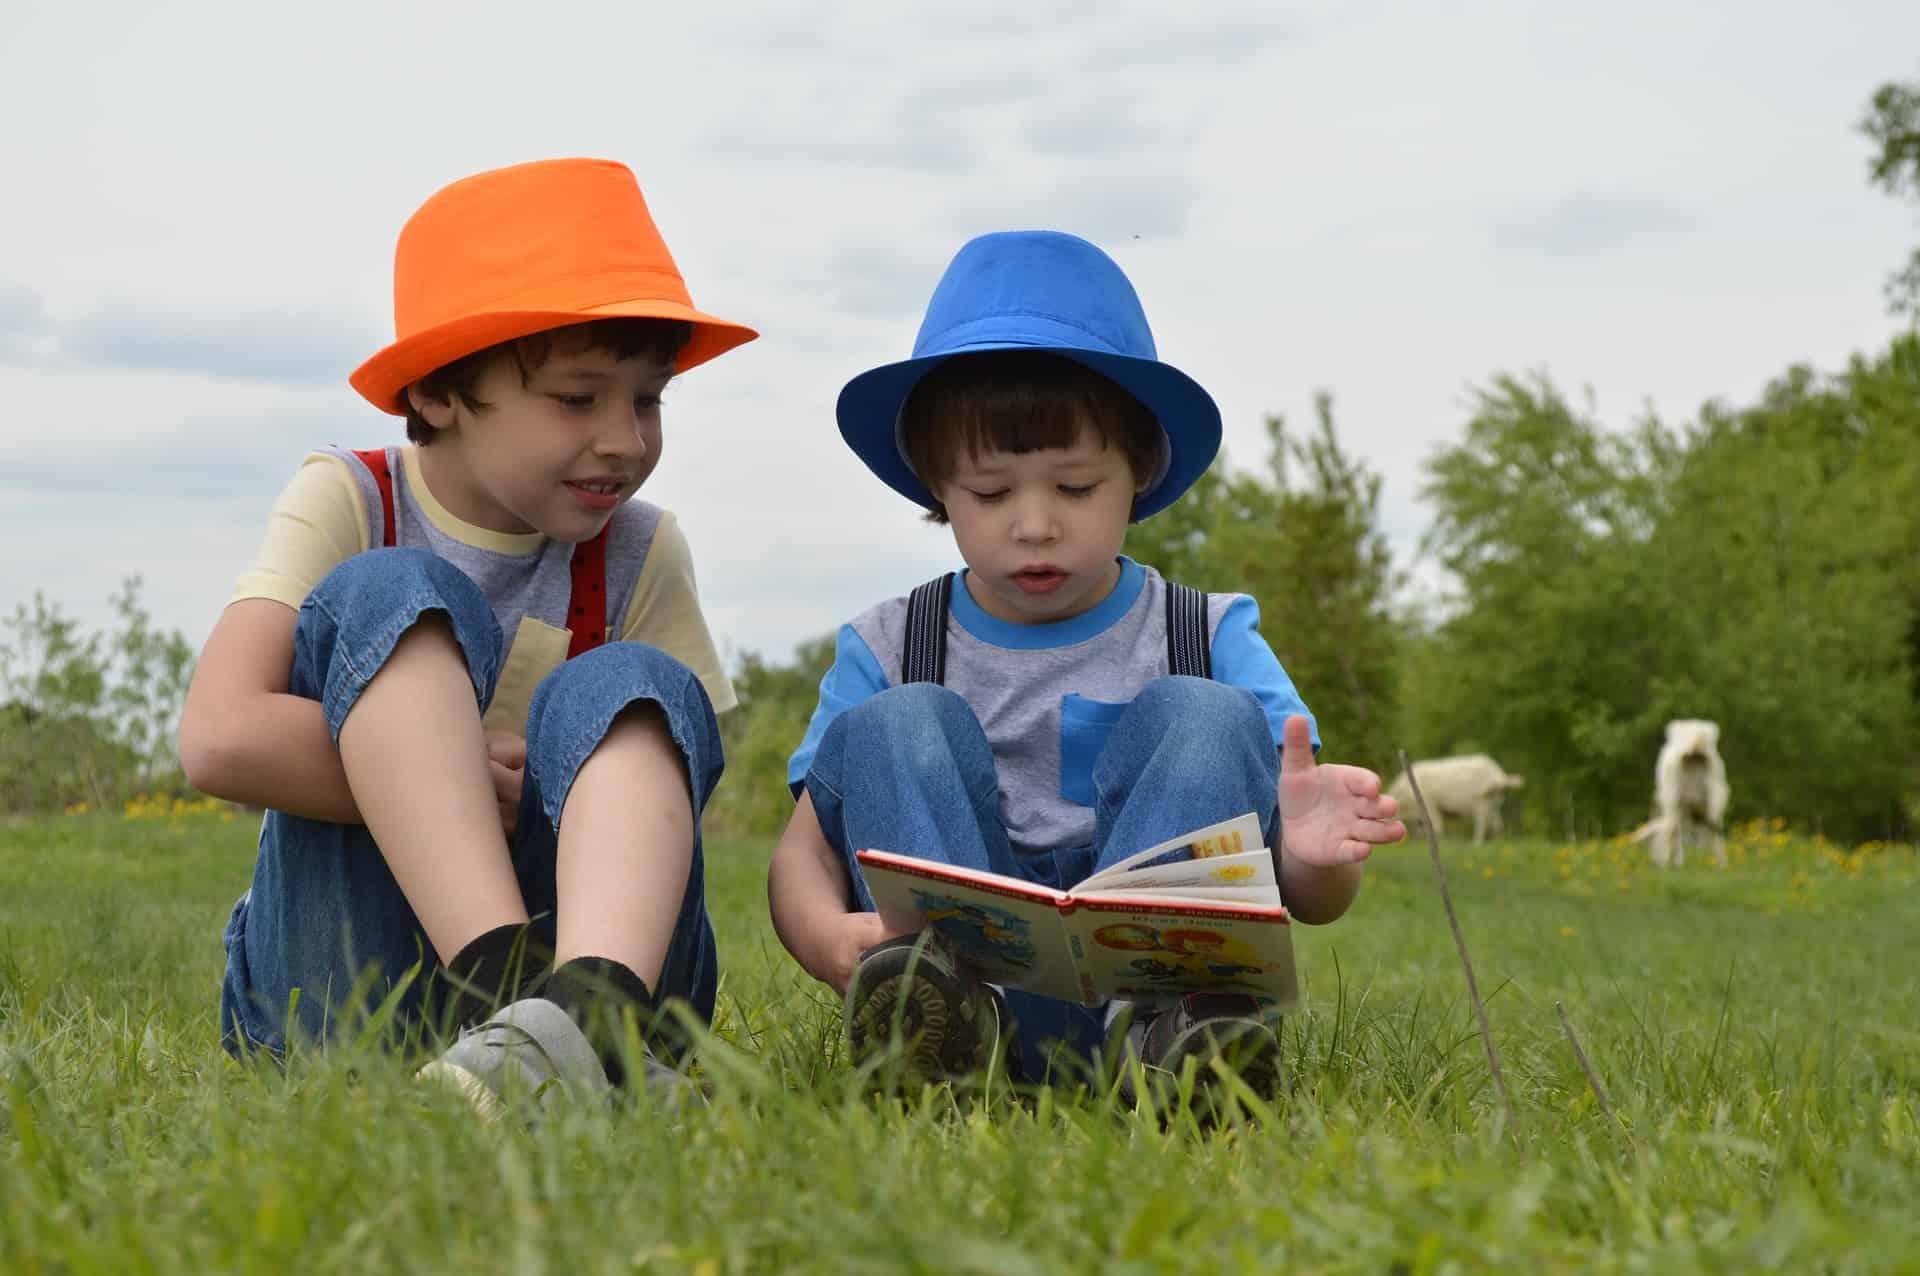 kids boys reading books pixabay